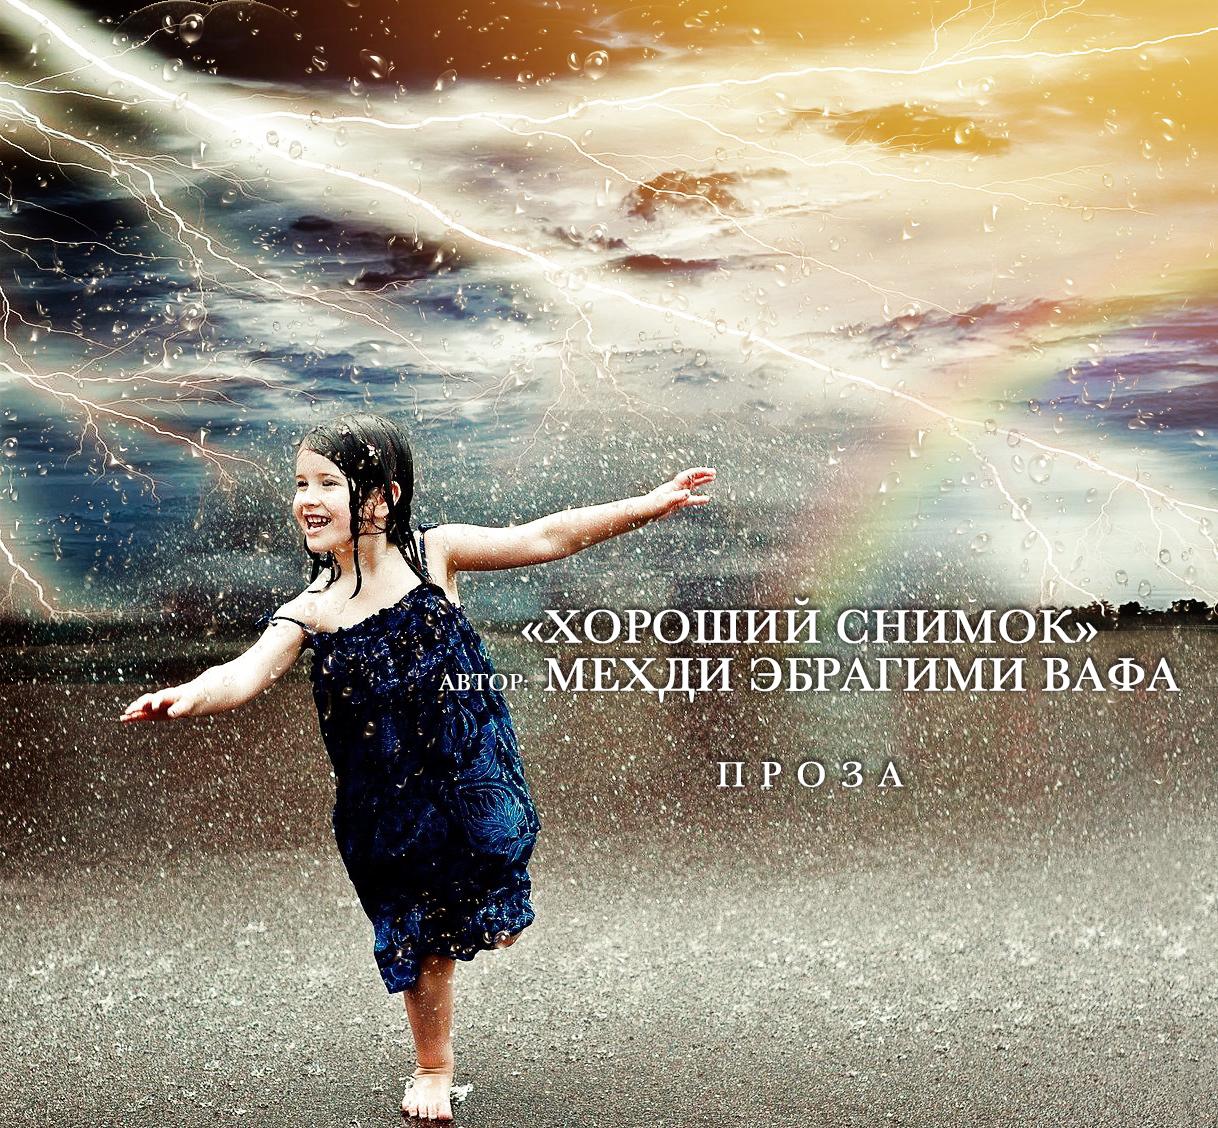 Хороший-снимок-проза-автор-Мехди-Эбрагими-Вафа